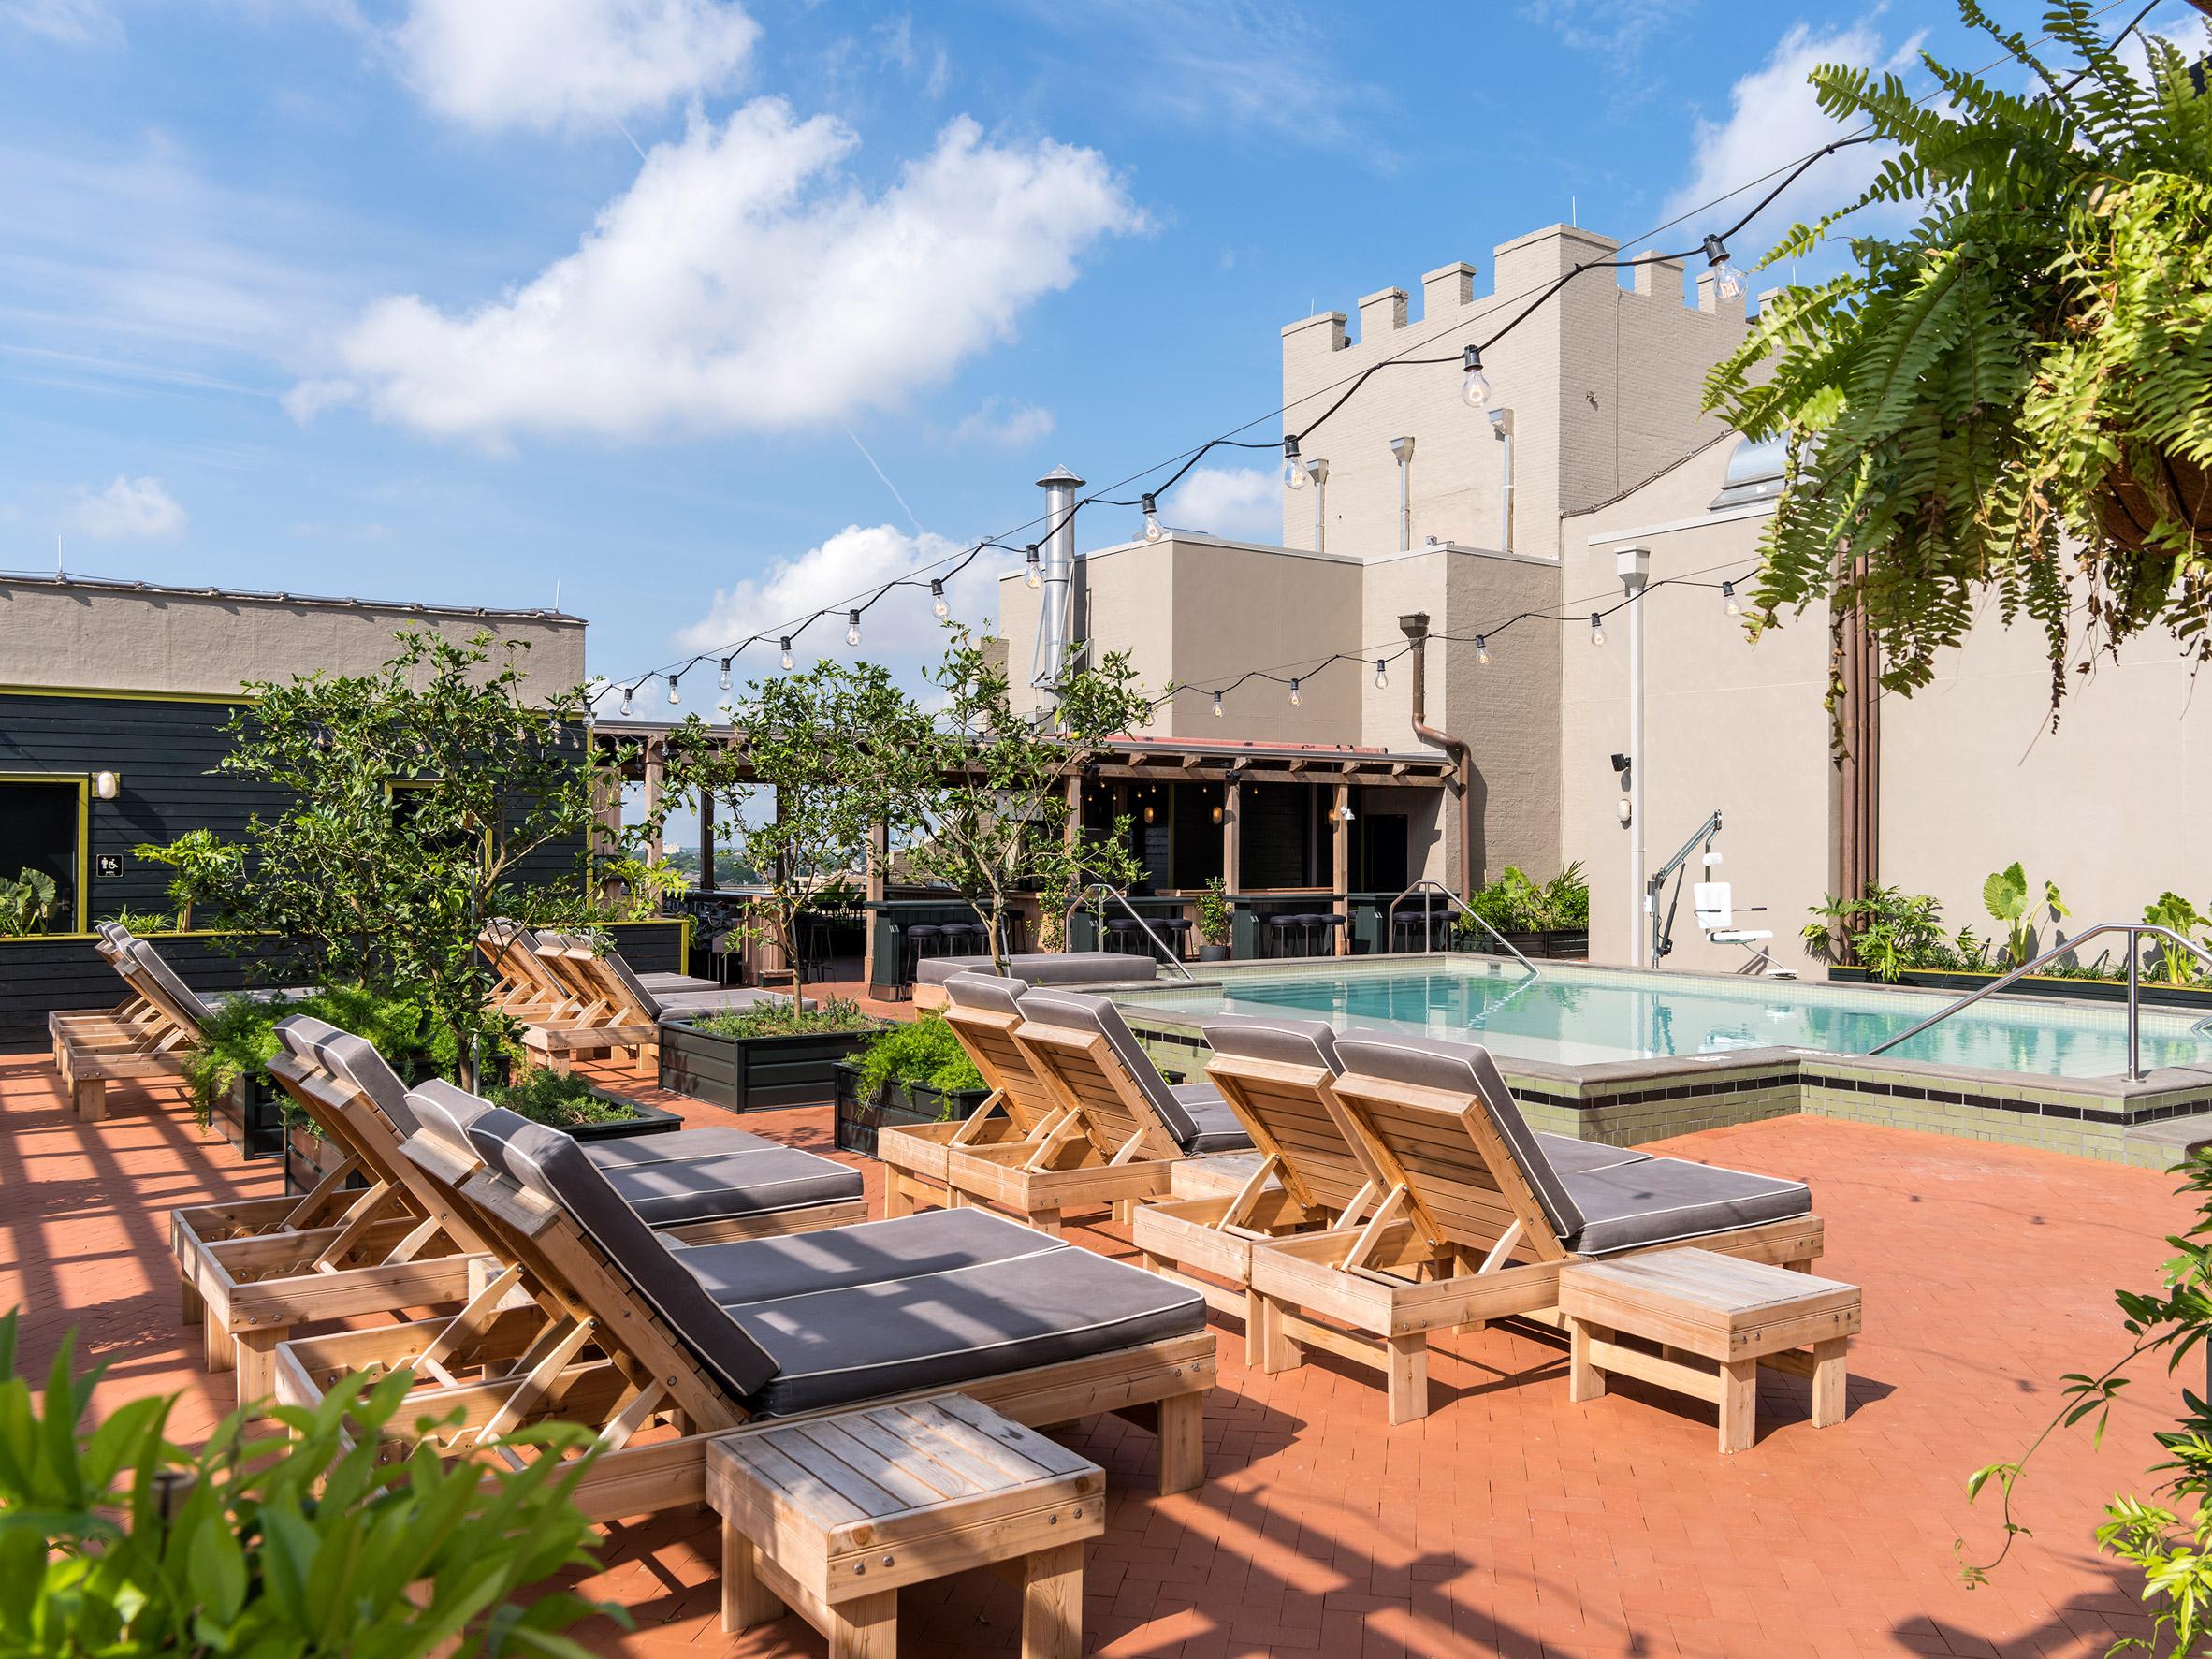 Ace Hotel New Orleans by Eskew+Dumez+Ripple